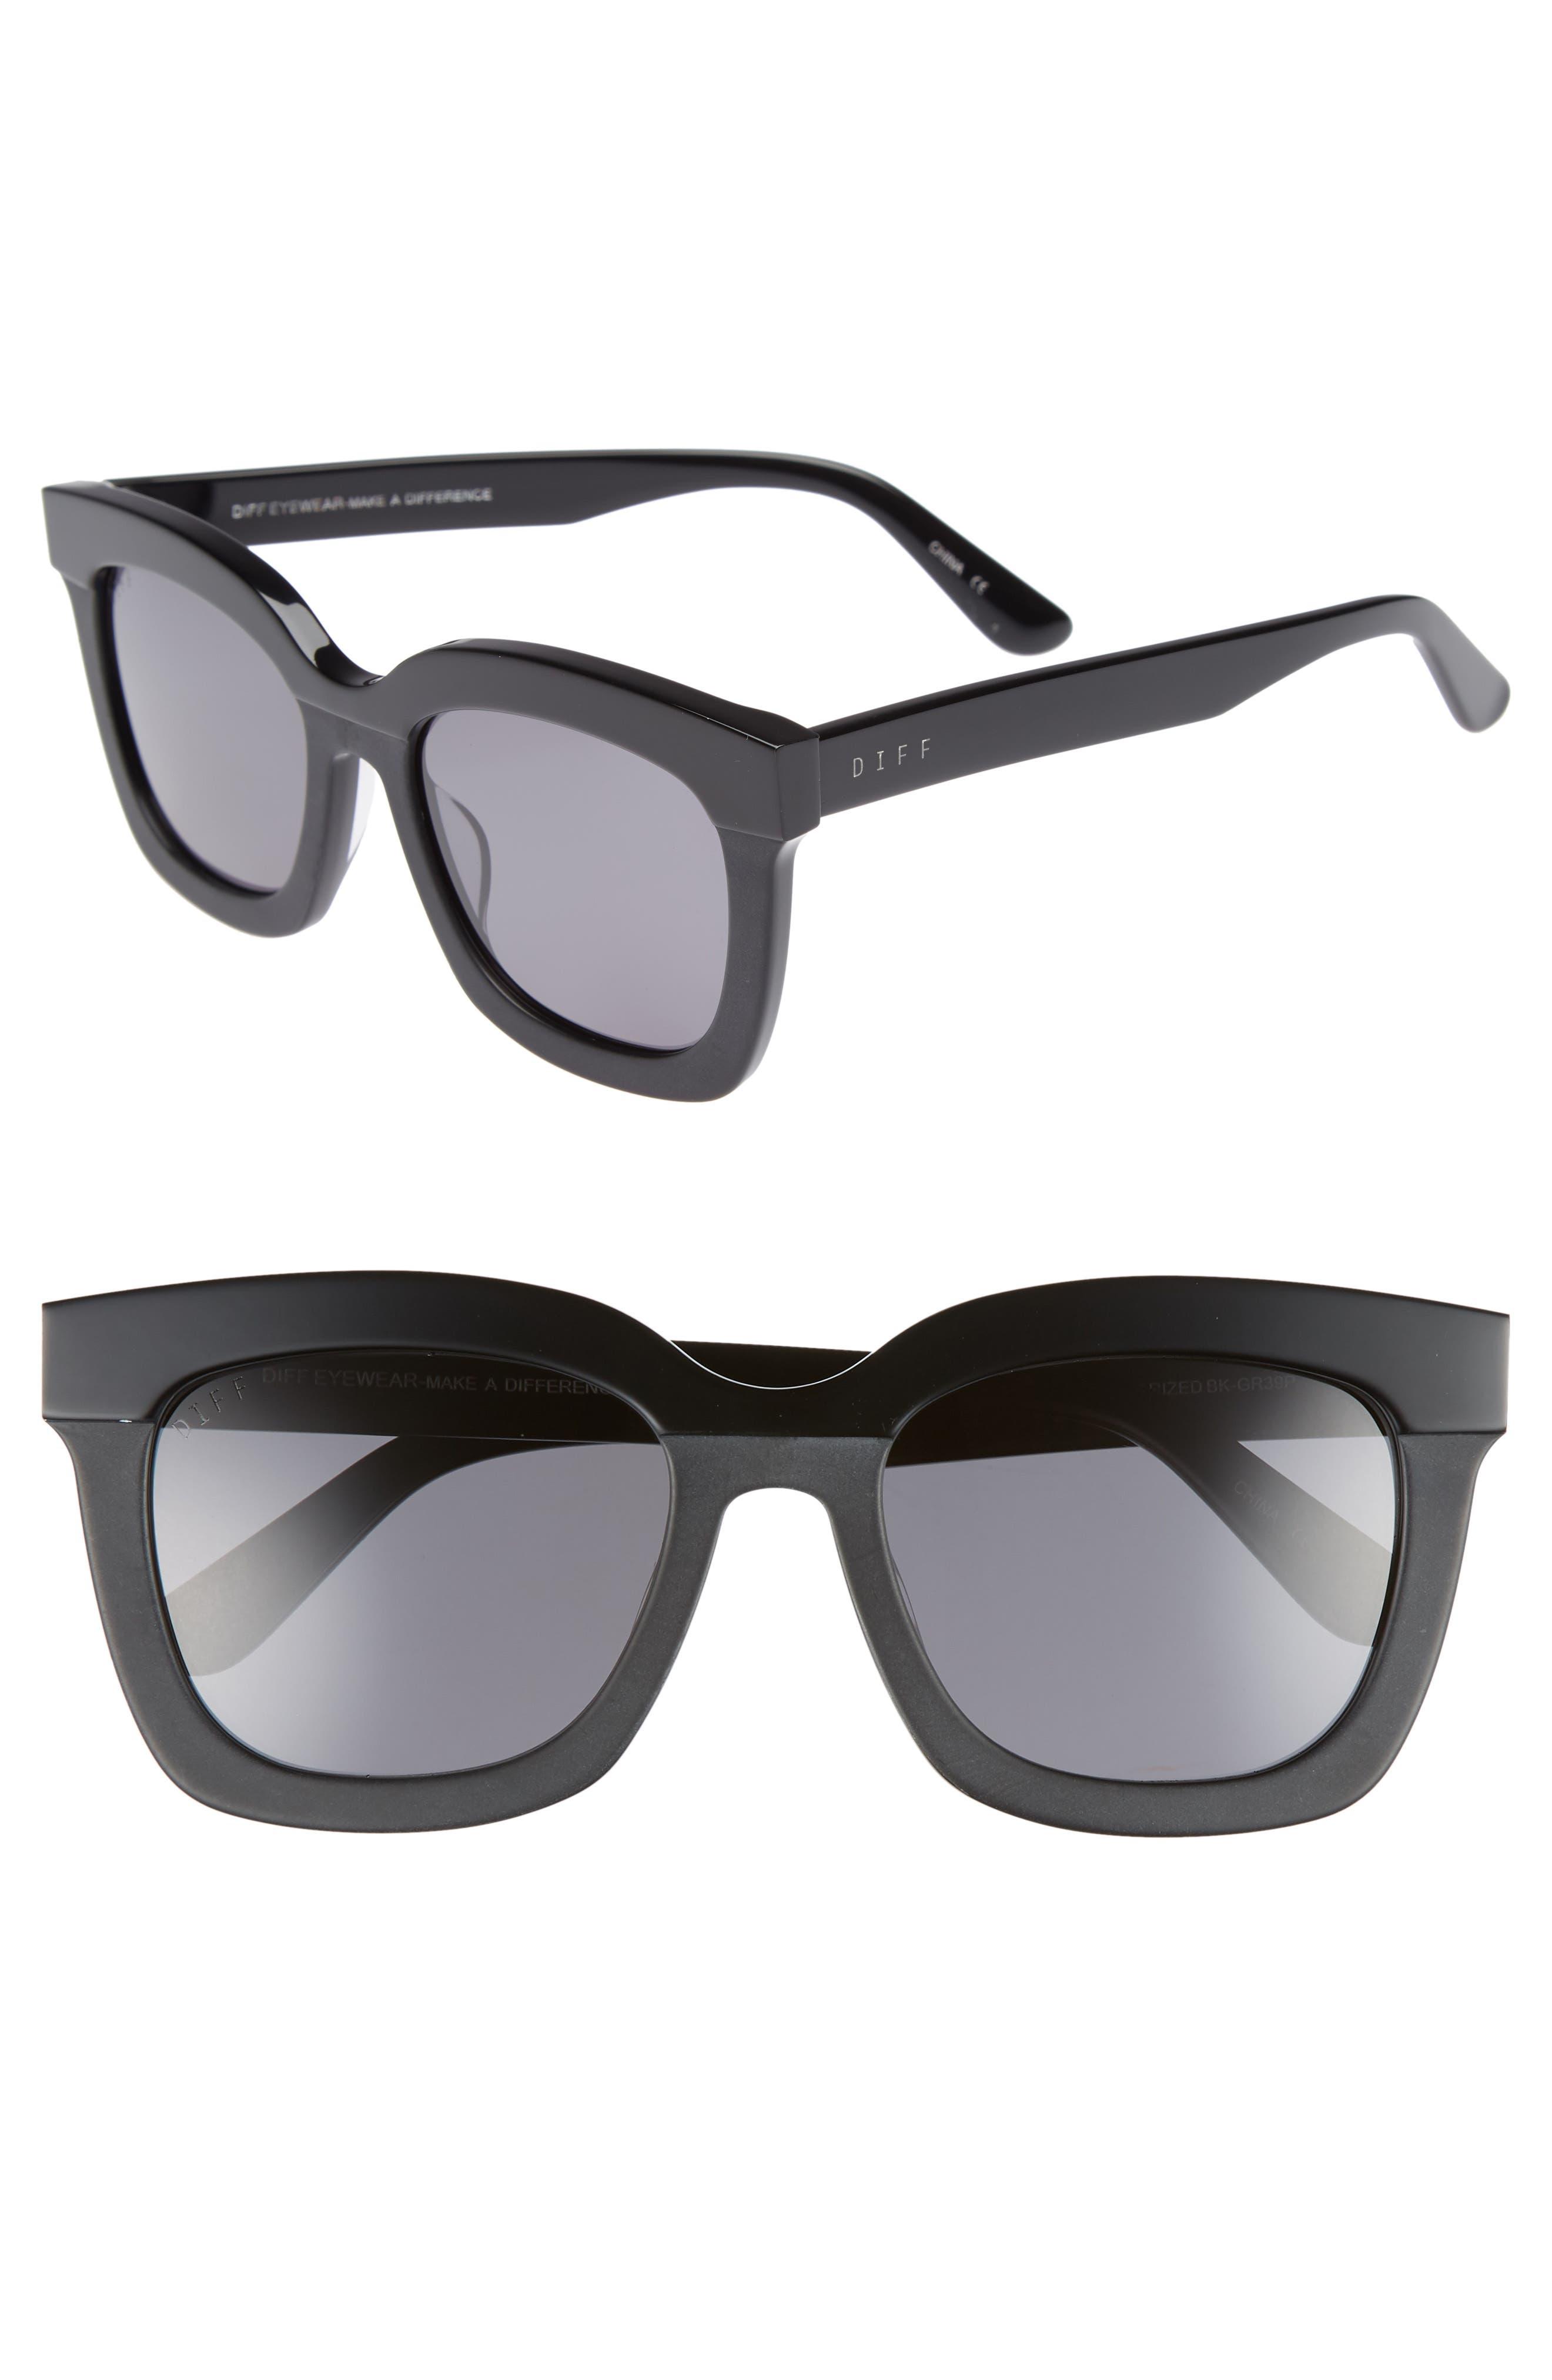 a3b322a2067ae DIFF Sunglasses for Women